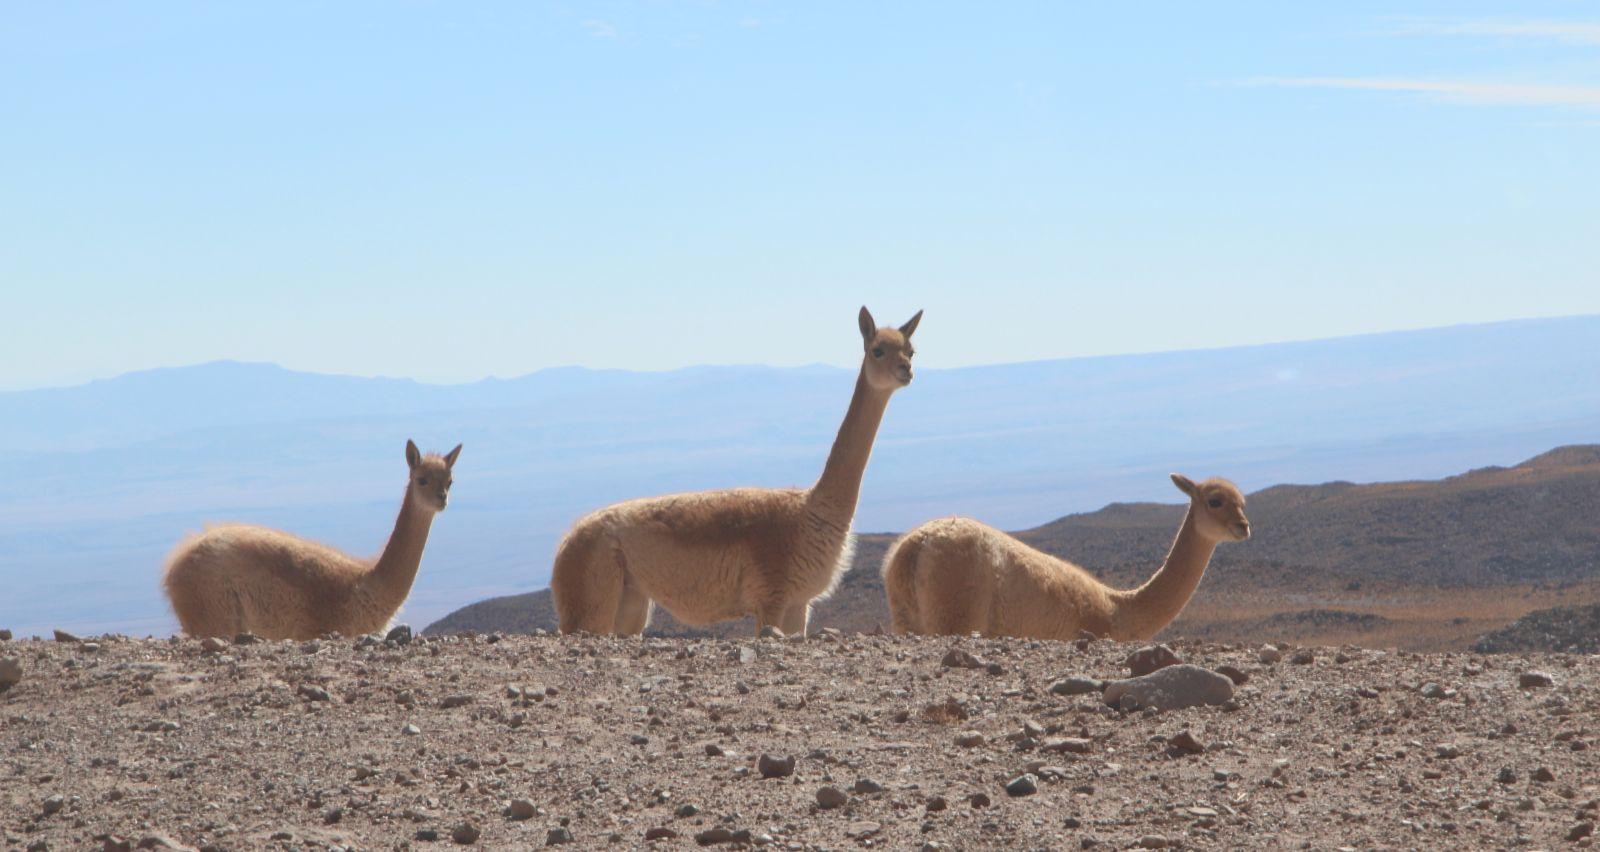 Fauna unterwegs: Vicuñas. Bild: Georg Görgen